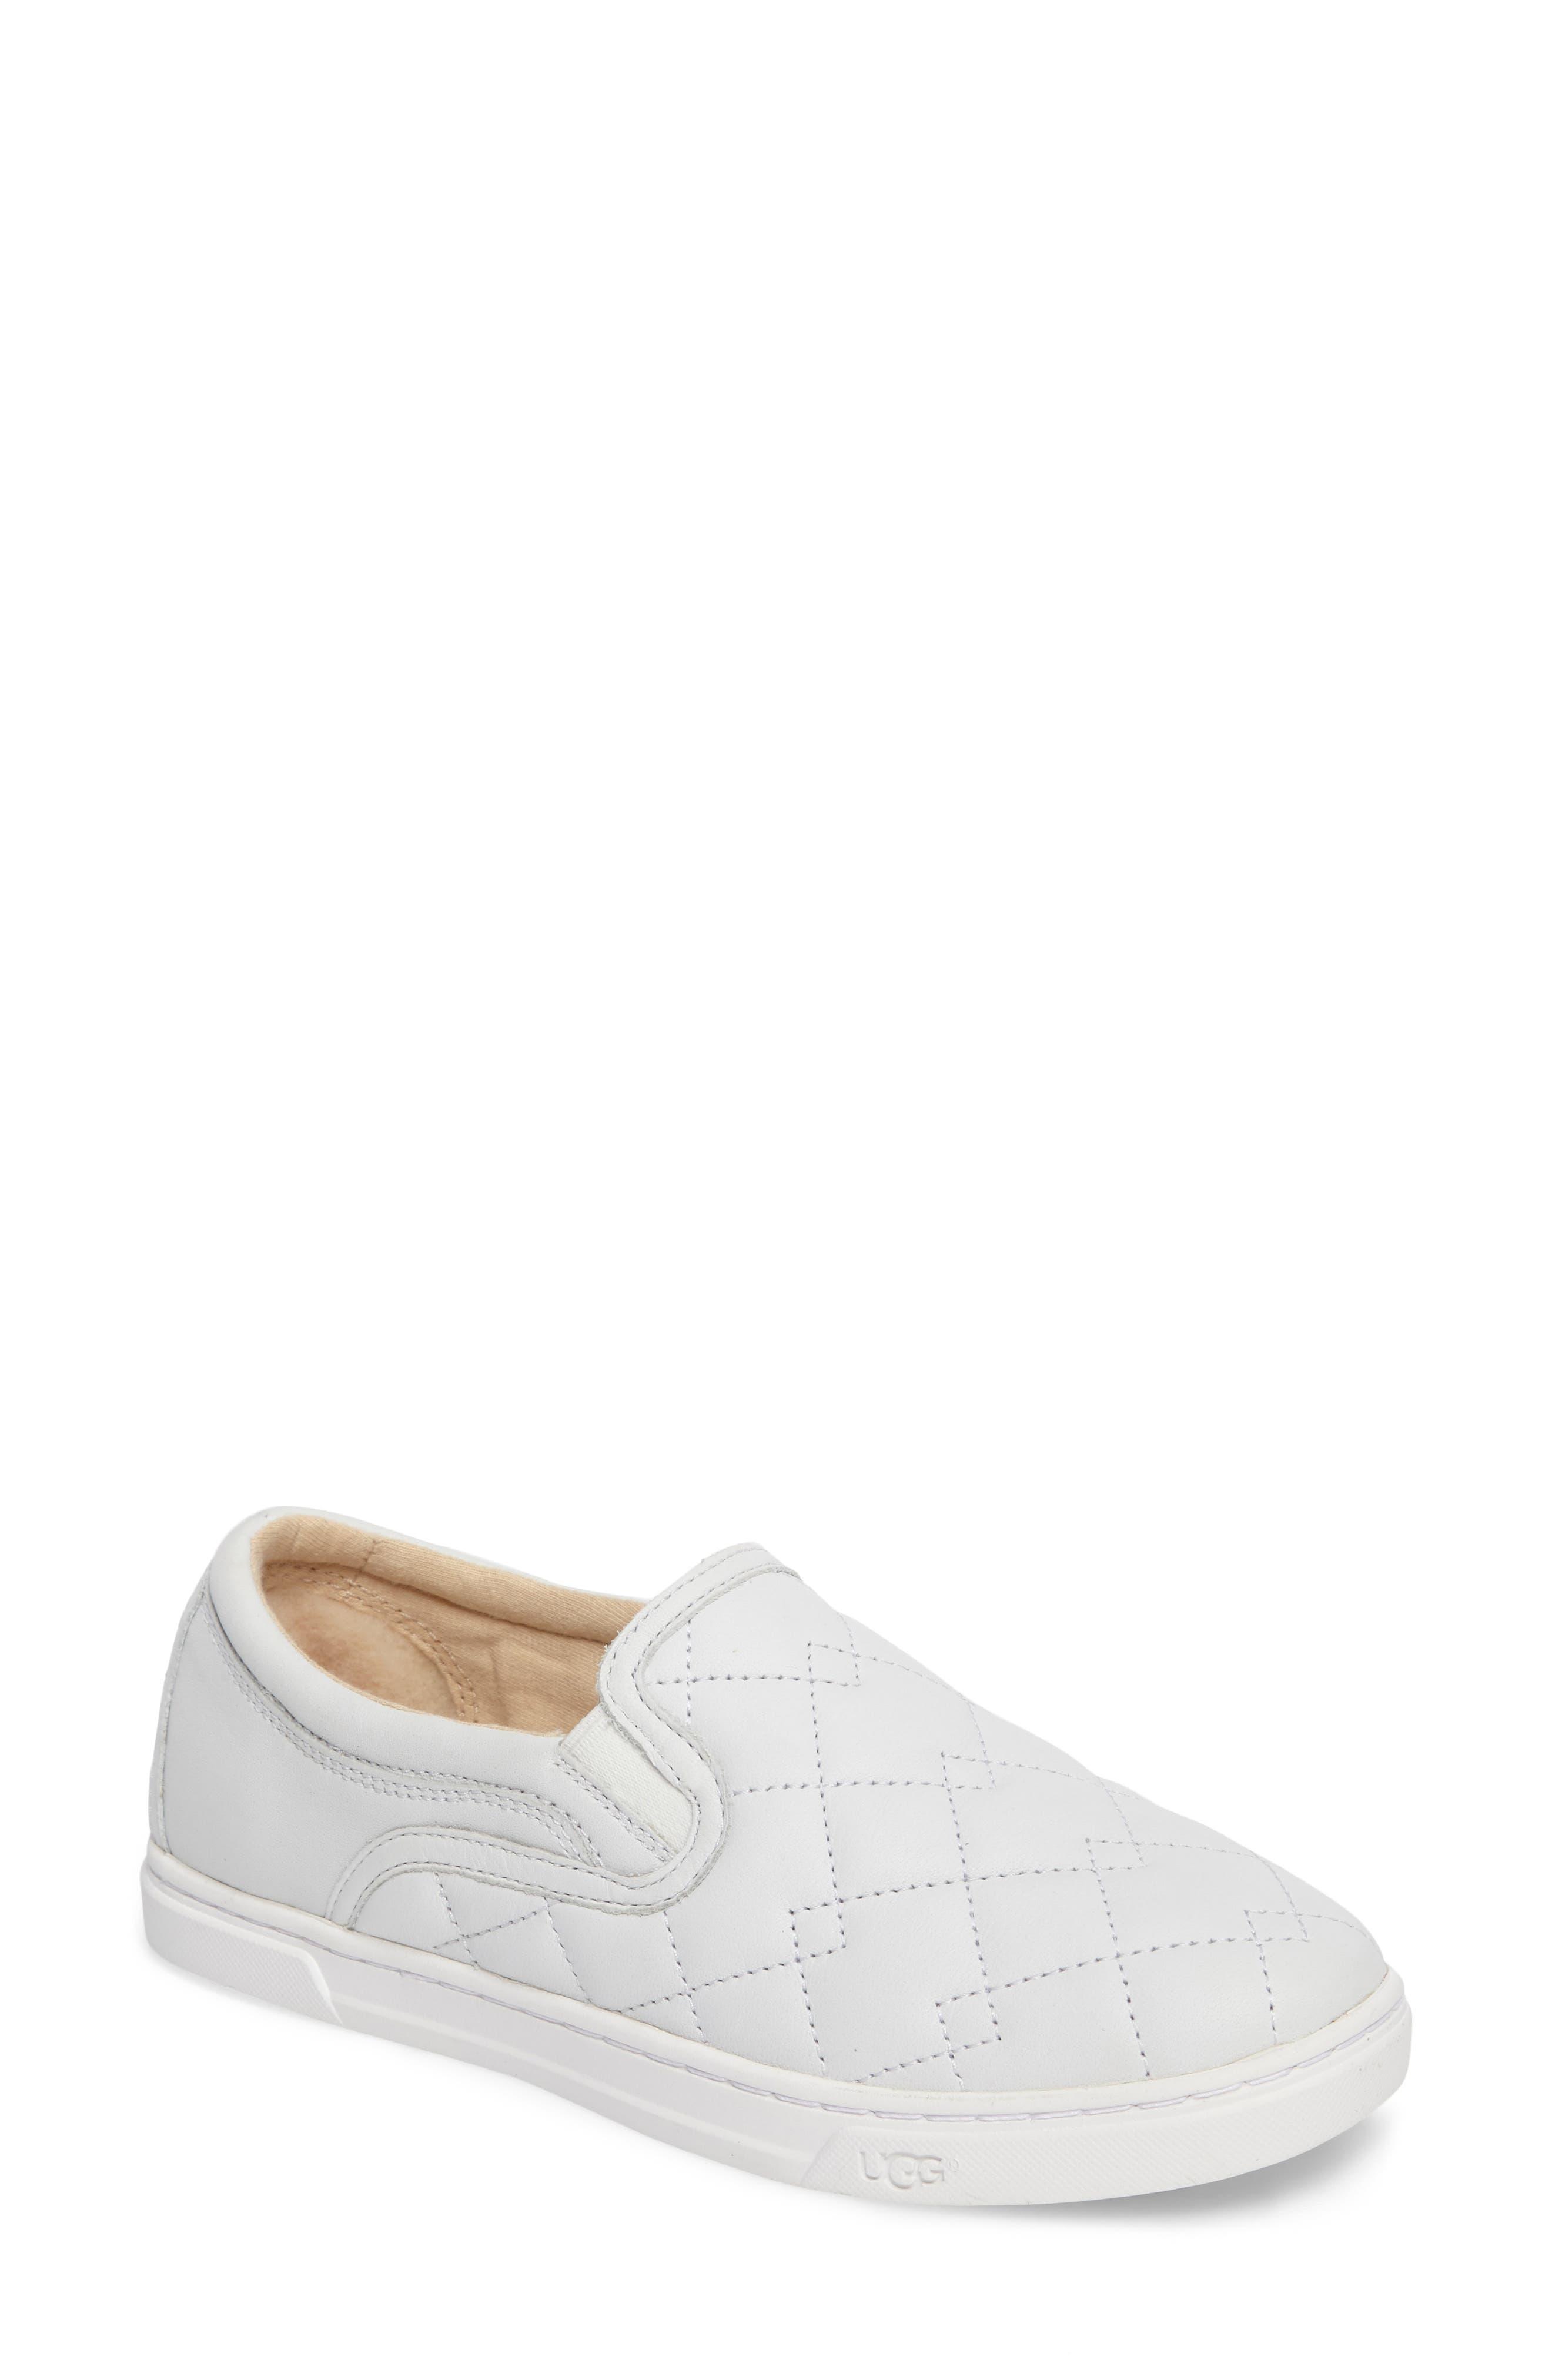 Alternate Image 1 Selected - UGG® Fierce Deco Quilted Slip-On Sneaker (Women)